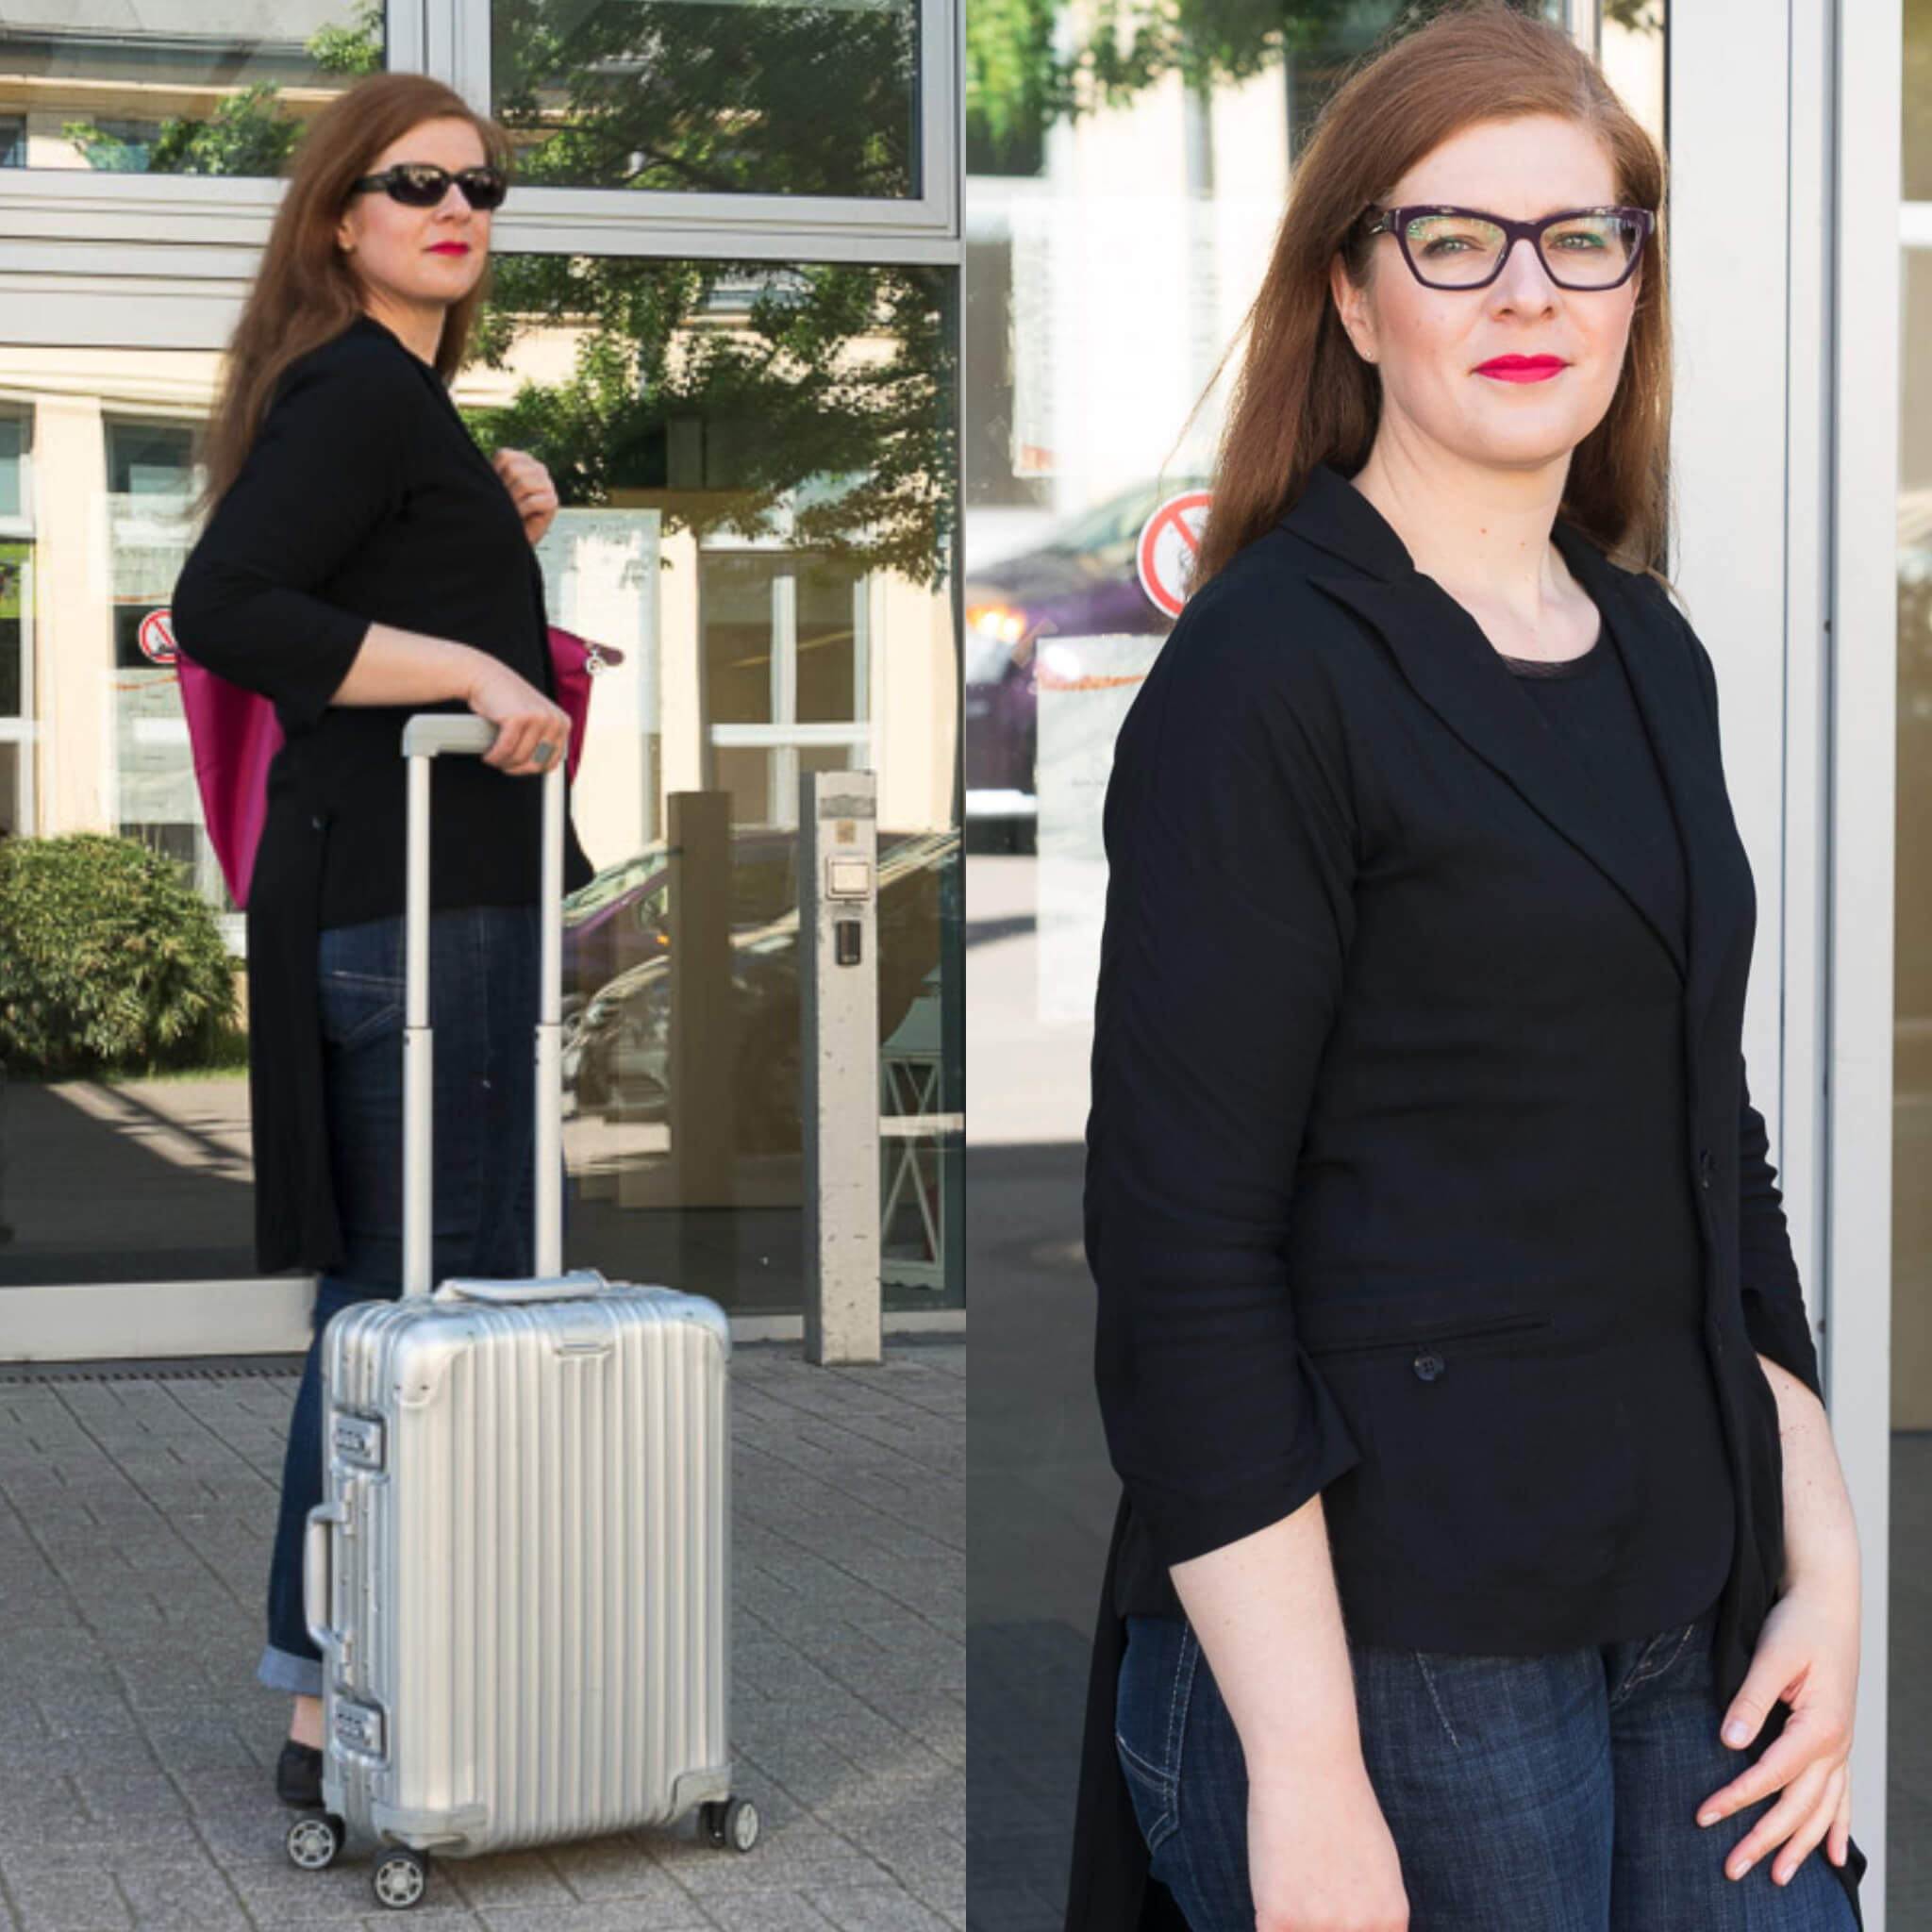 Zeit reisen Stylerebelles Ü40 blog